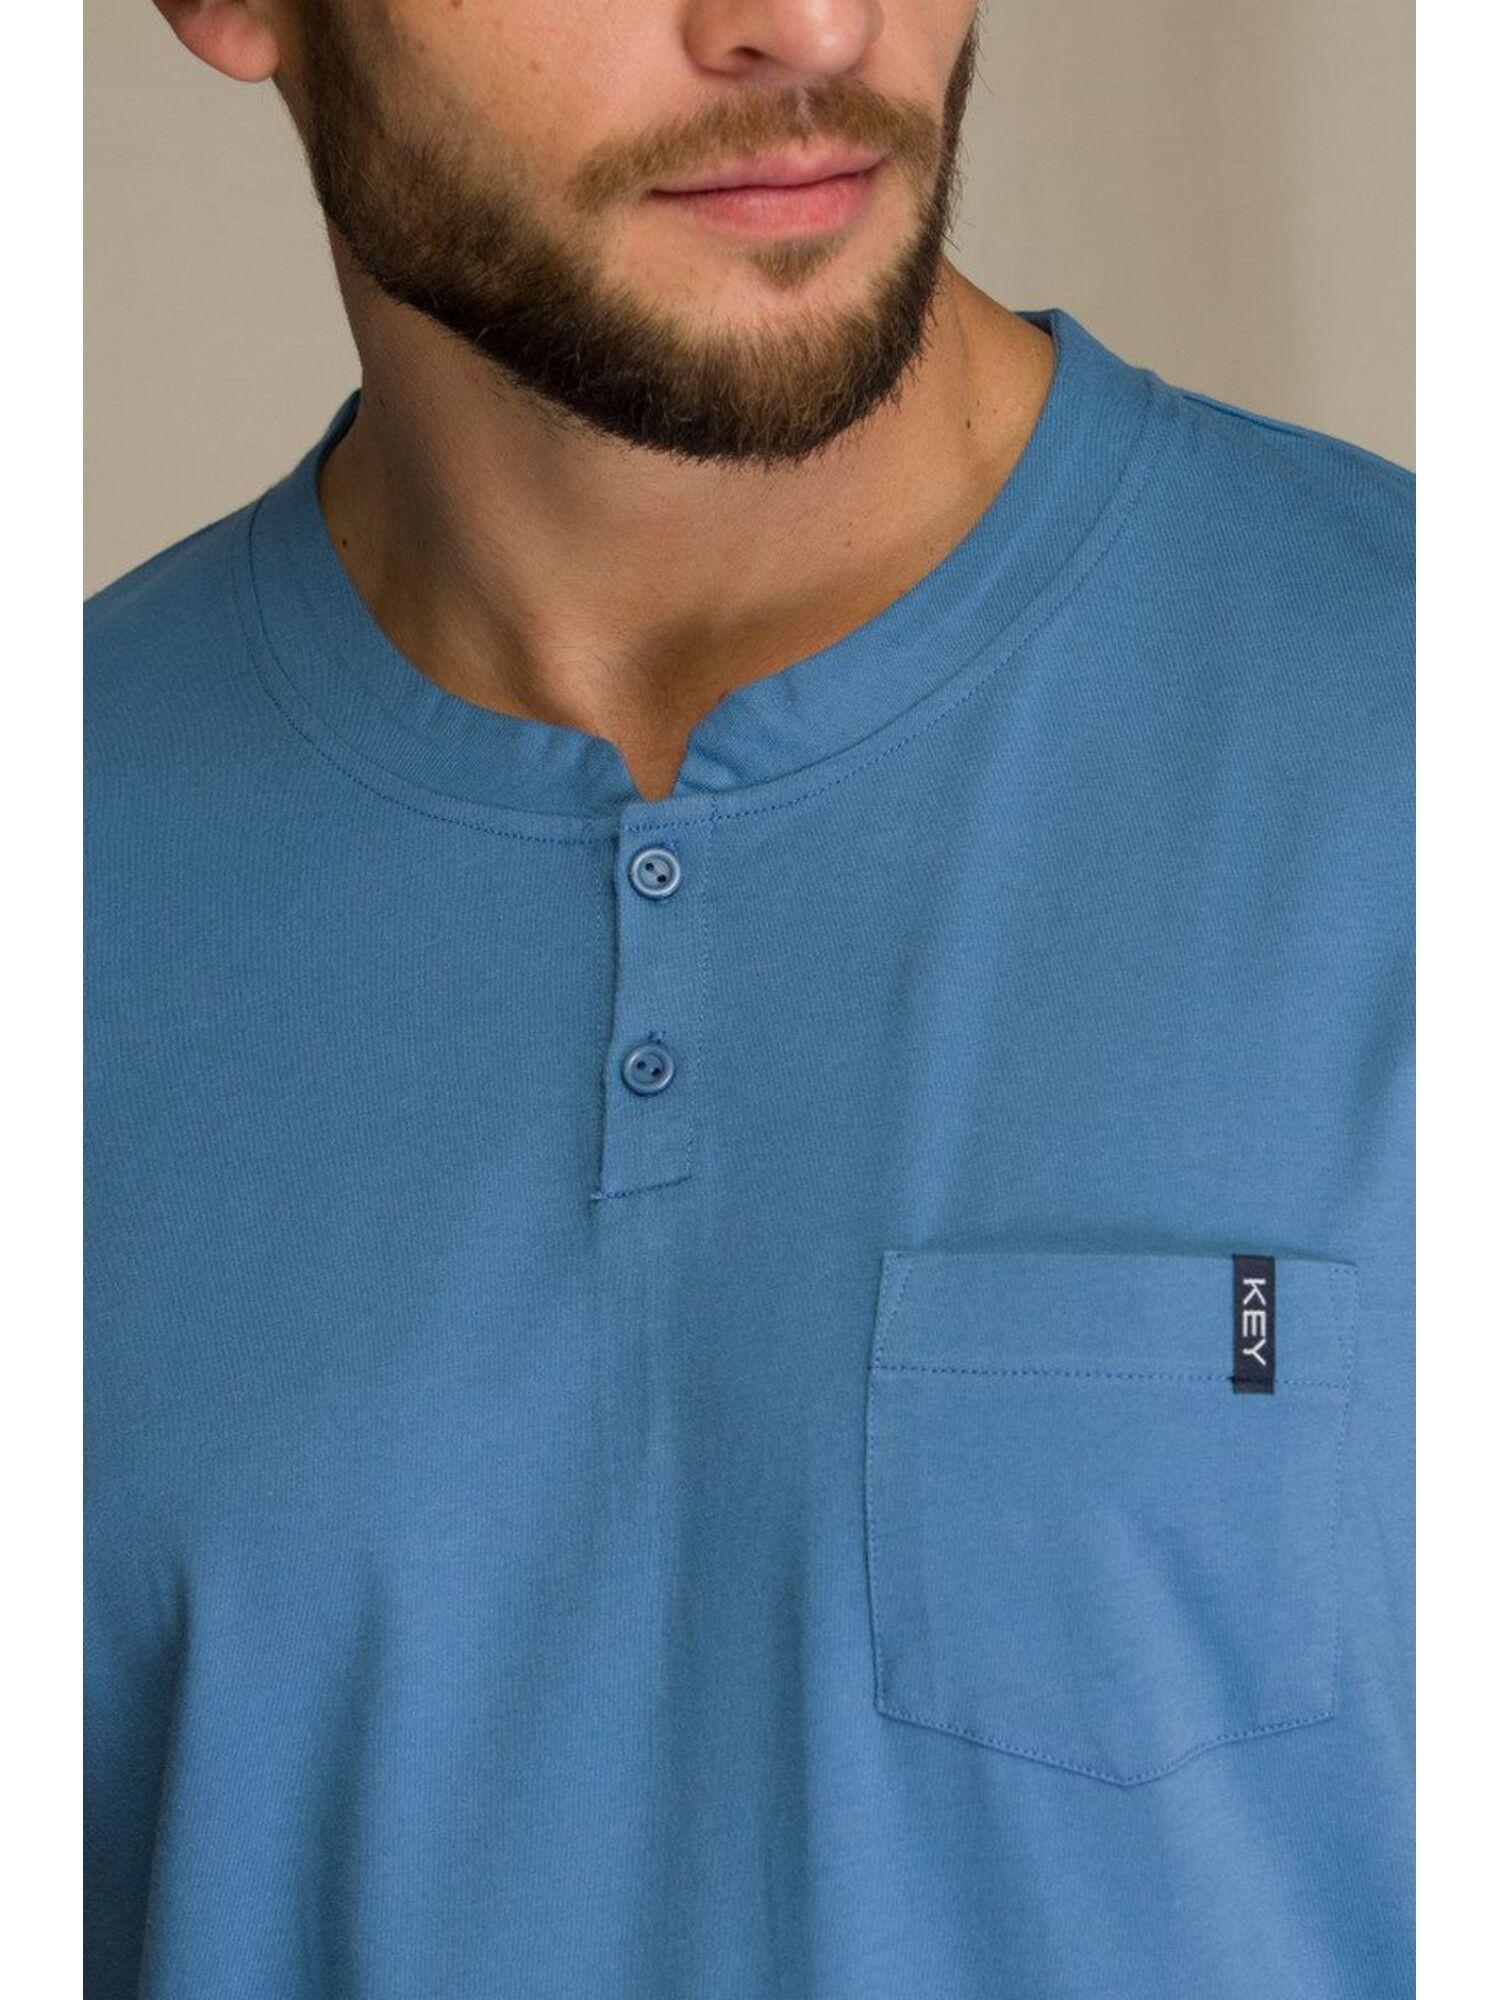 Пижама мужская с шортами MNS 223 A21, синий, KEY